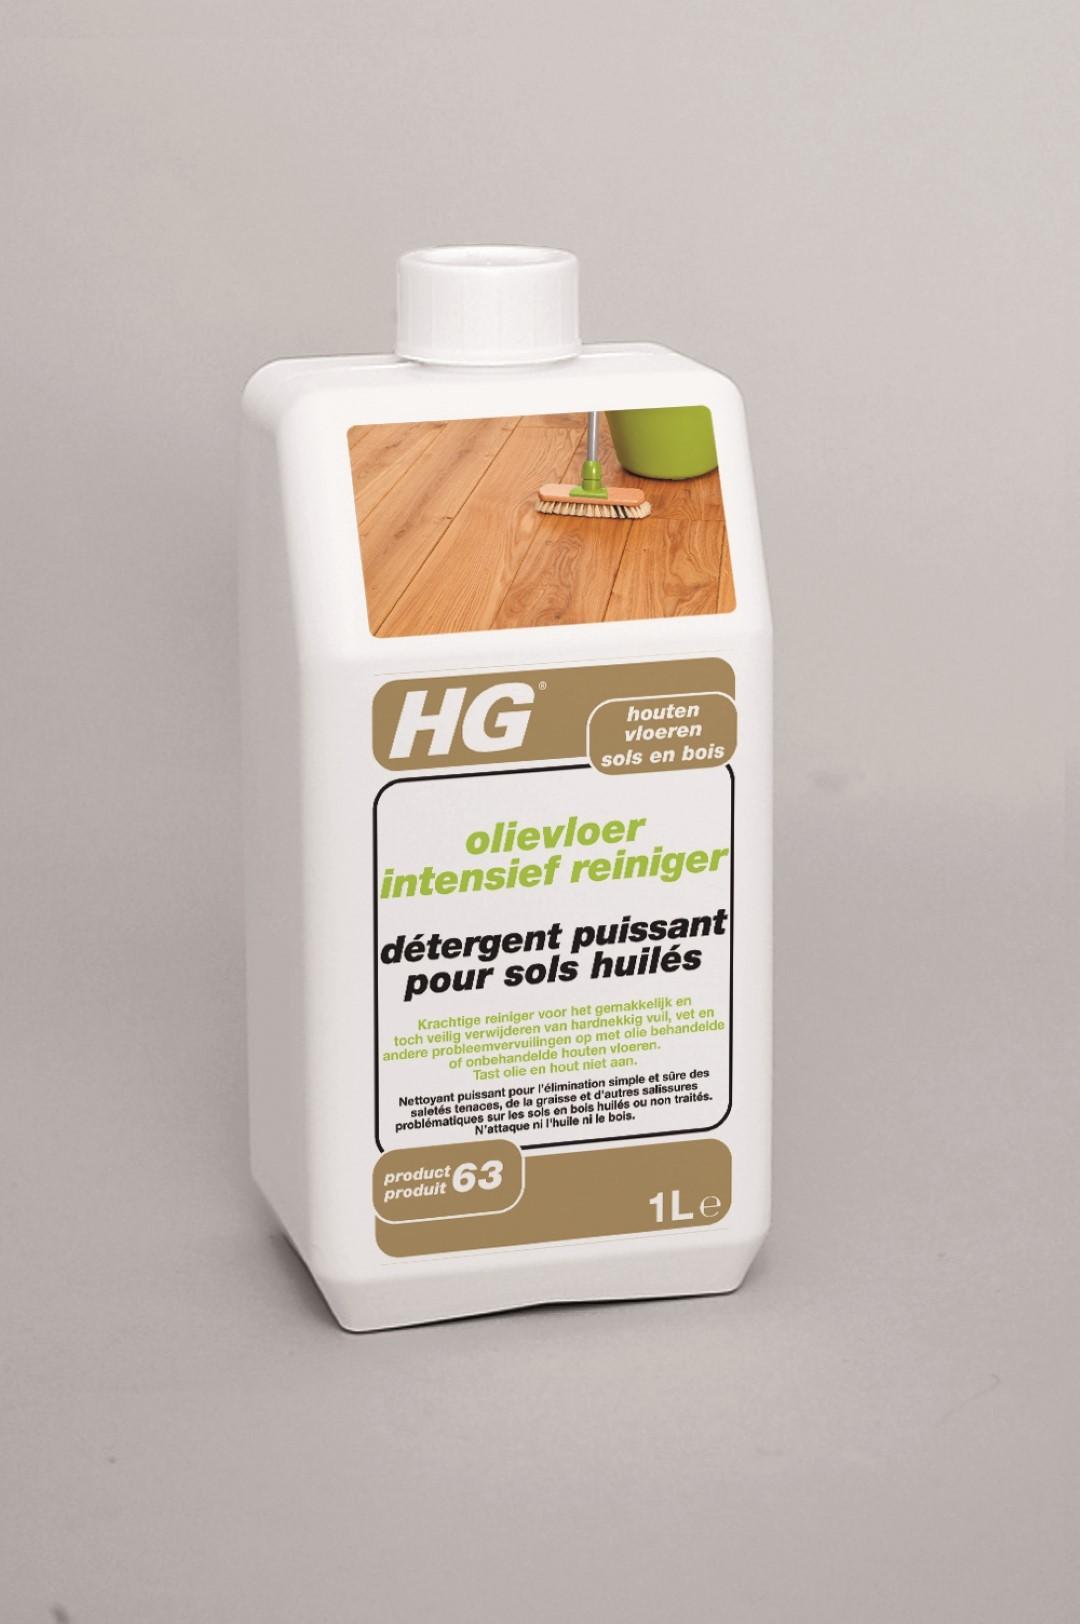 olievloer intensief reiniger (HG product 63)